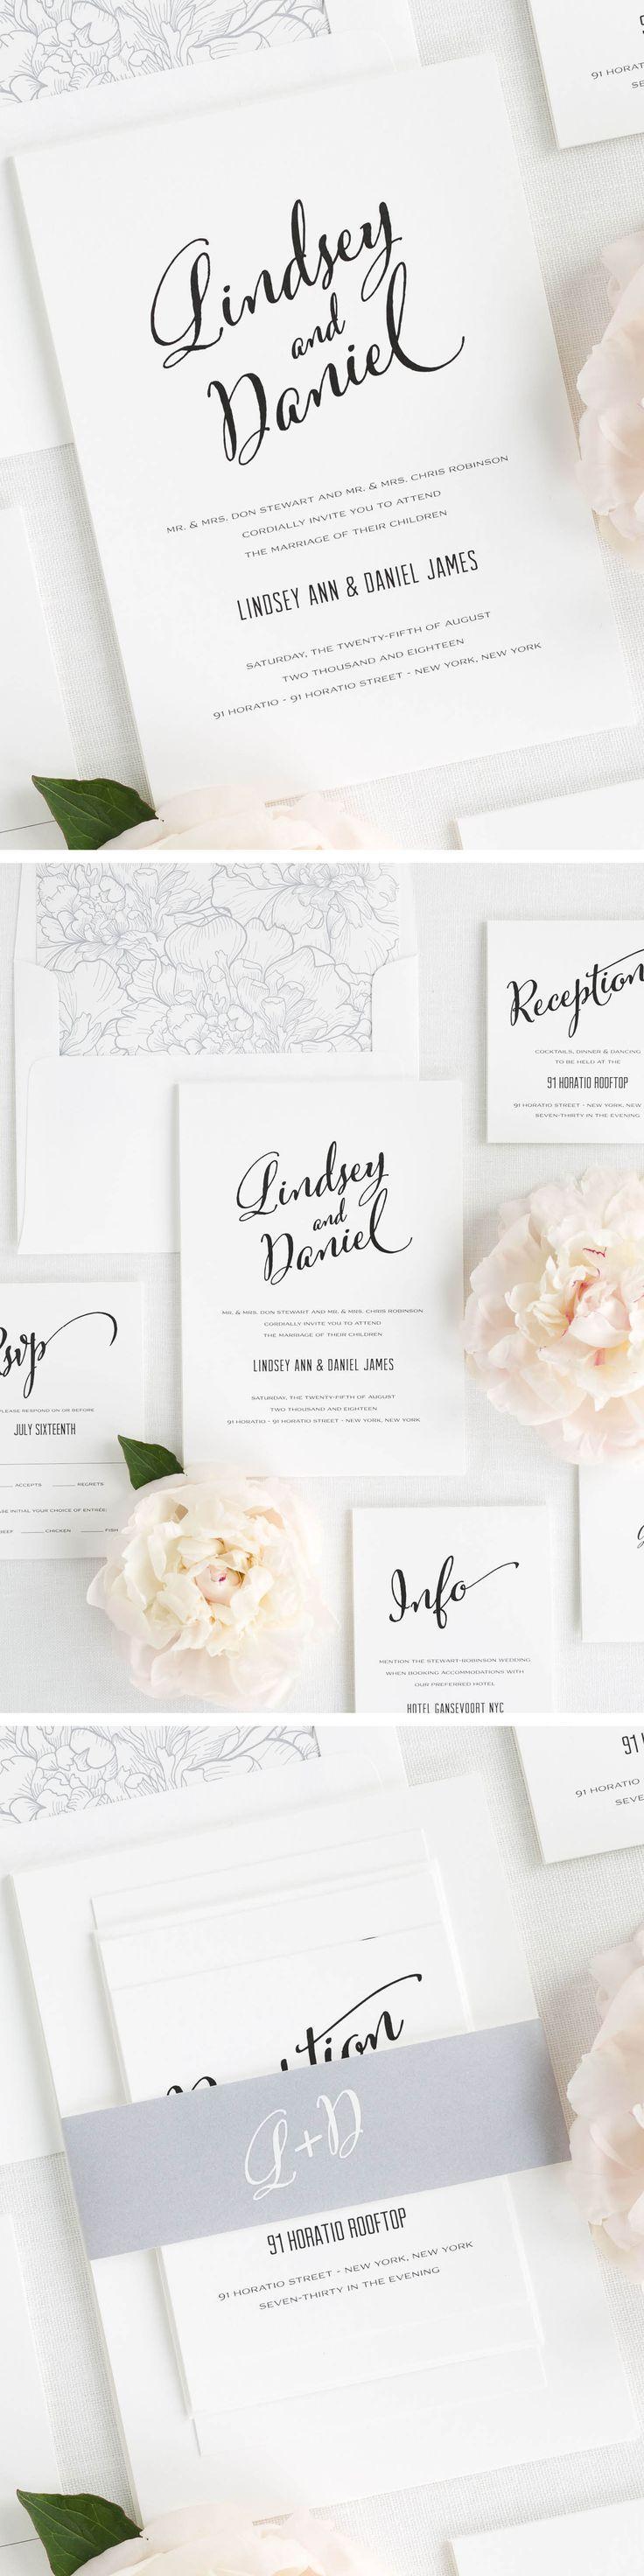 283 best WEDDING INVITES images on Pinterest | Invitation cards ...